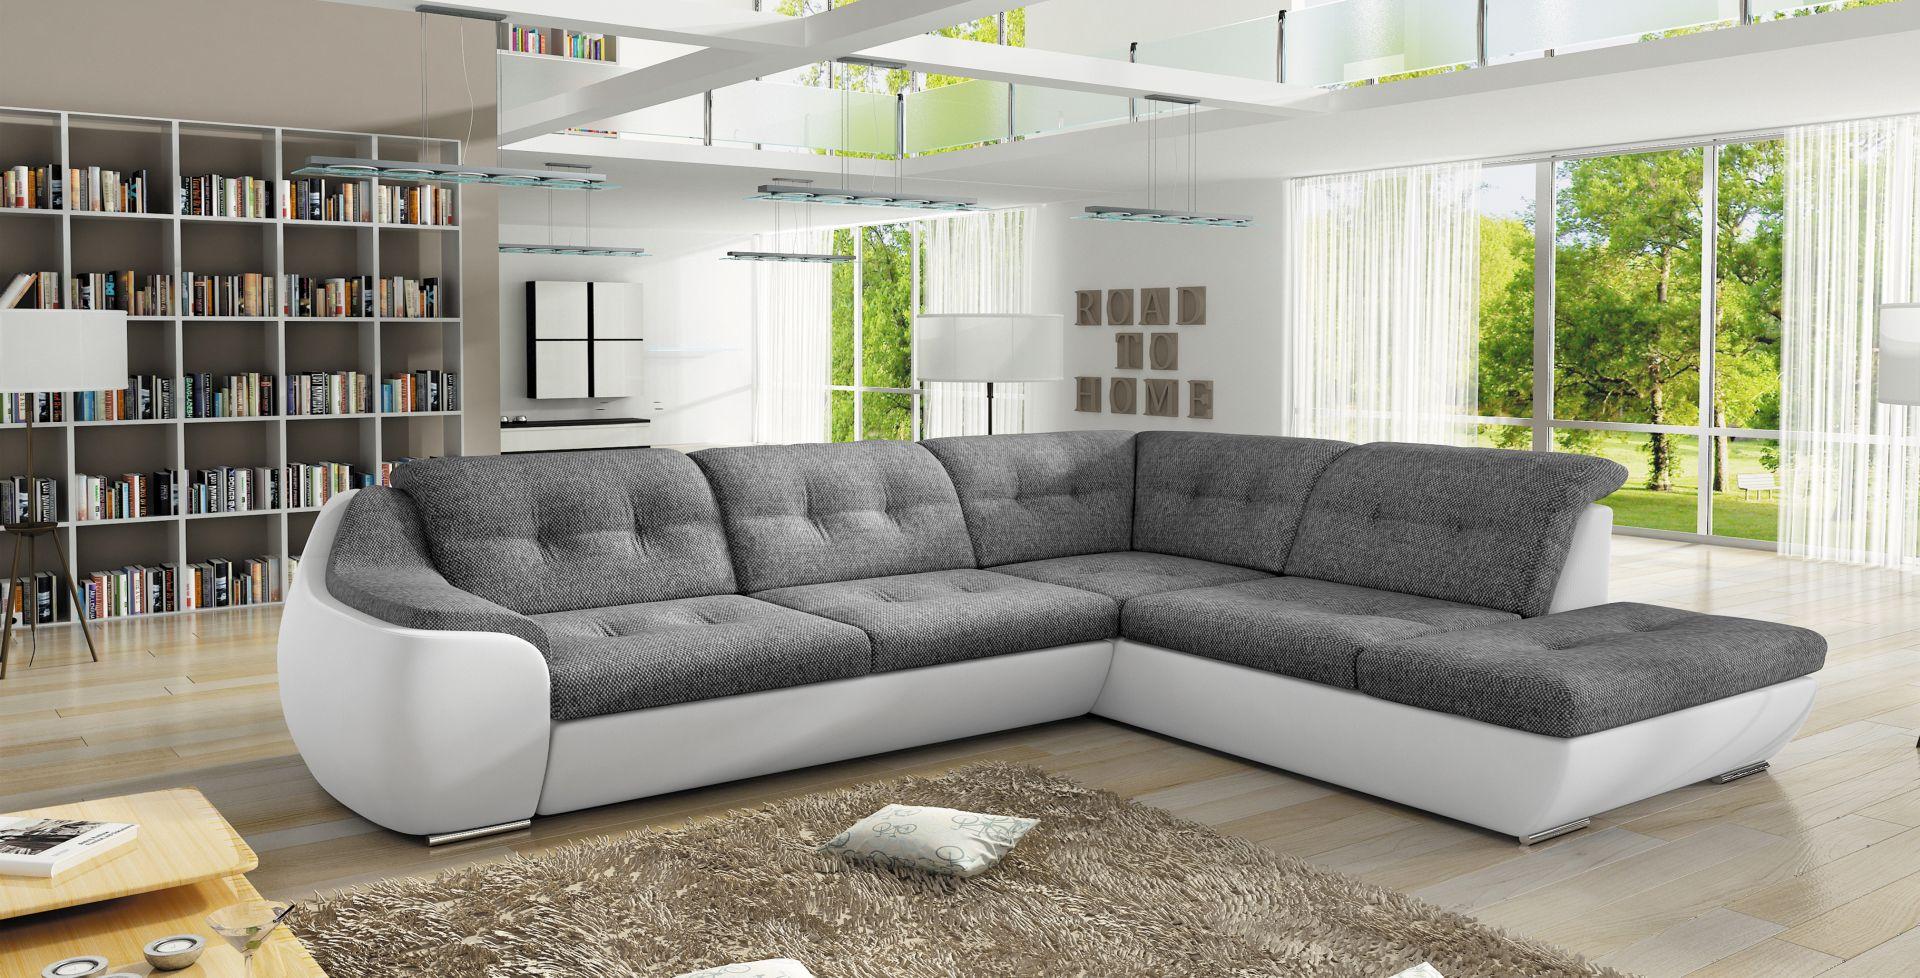 sofa schlafsofa designer sofa mit bettfunktion bettkasten ecksofa couch neu galaxy d www. Black Bedroom Furniture Sets. Home Design Ideas